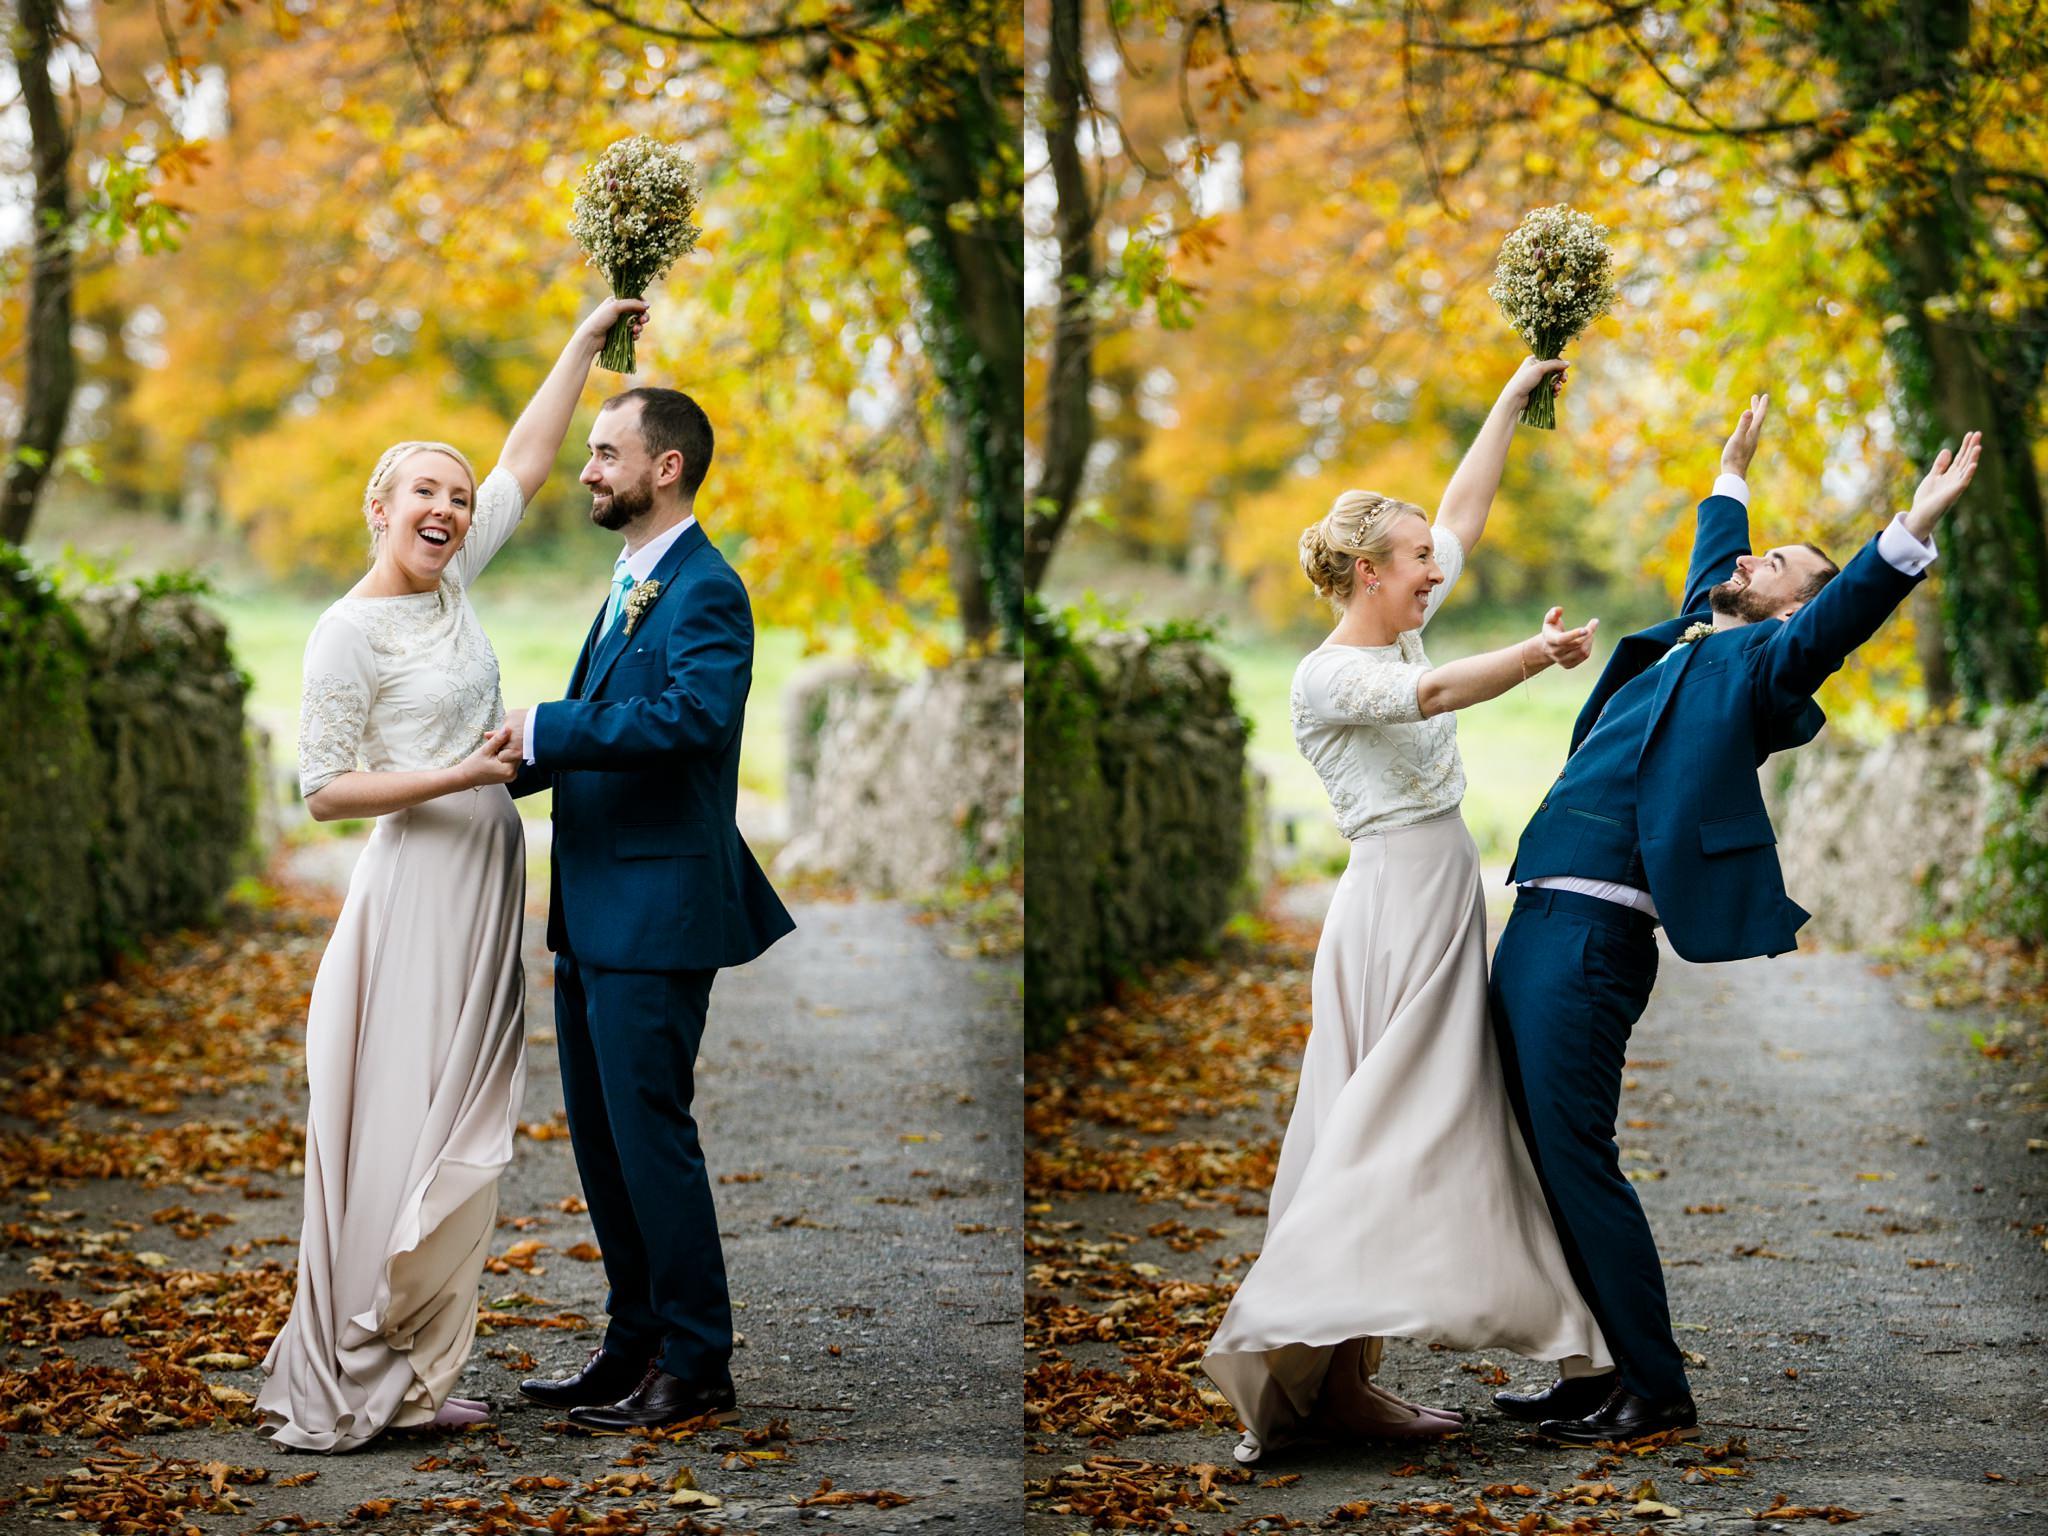 Elisha-Clarke-Photography-Dublin-City-Wedding_0096.jpg